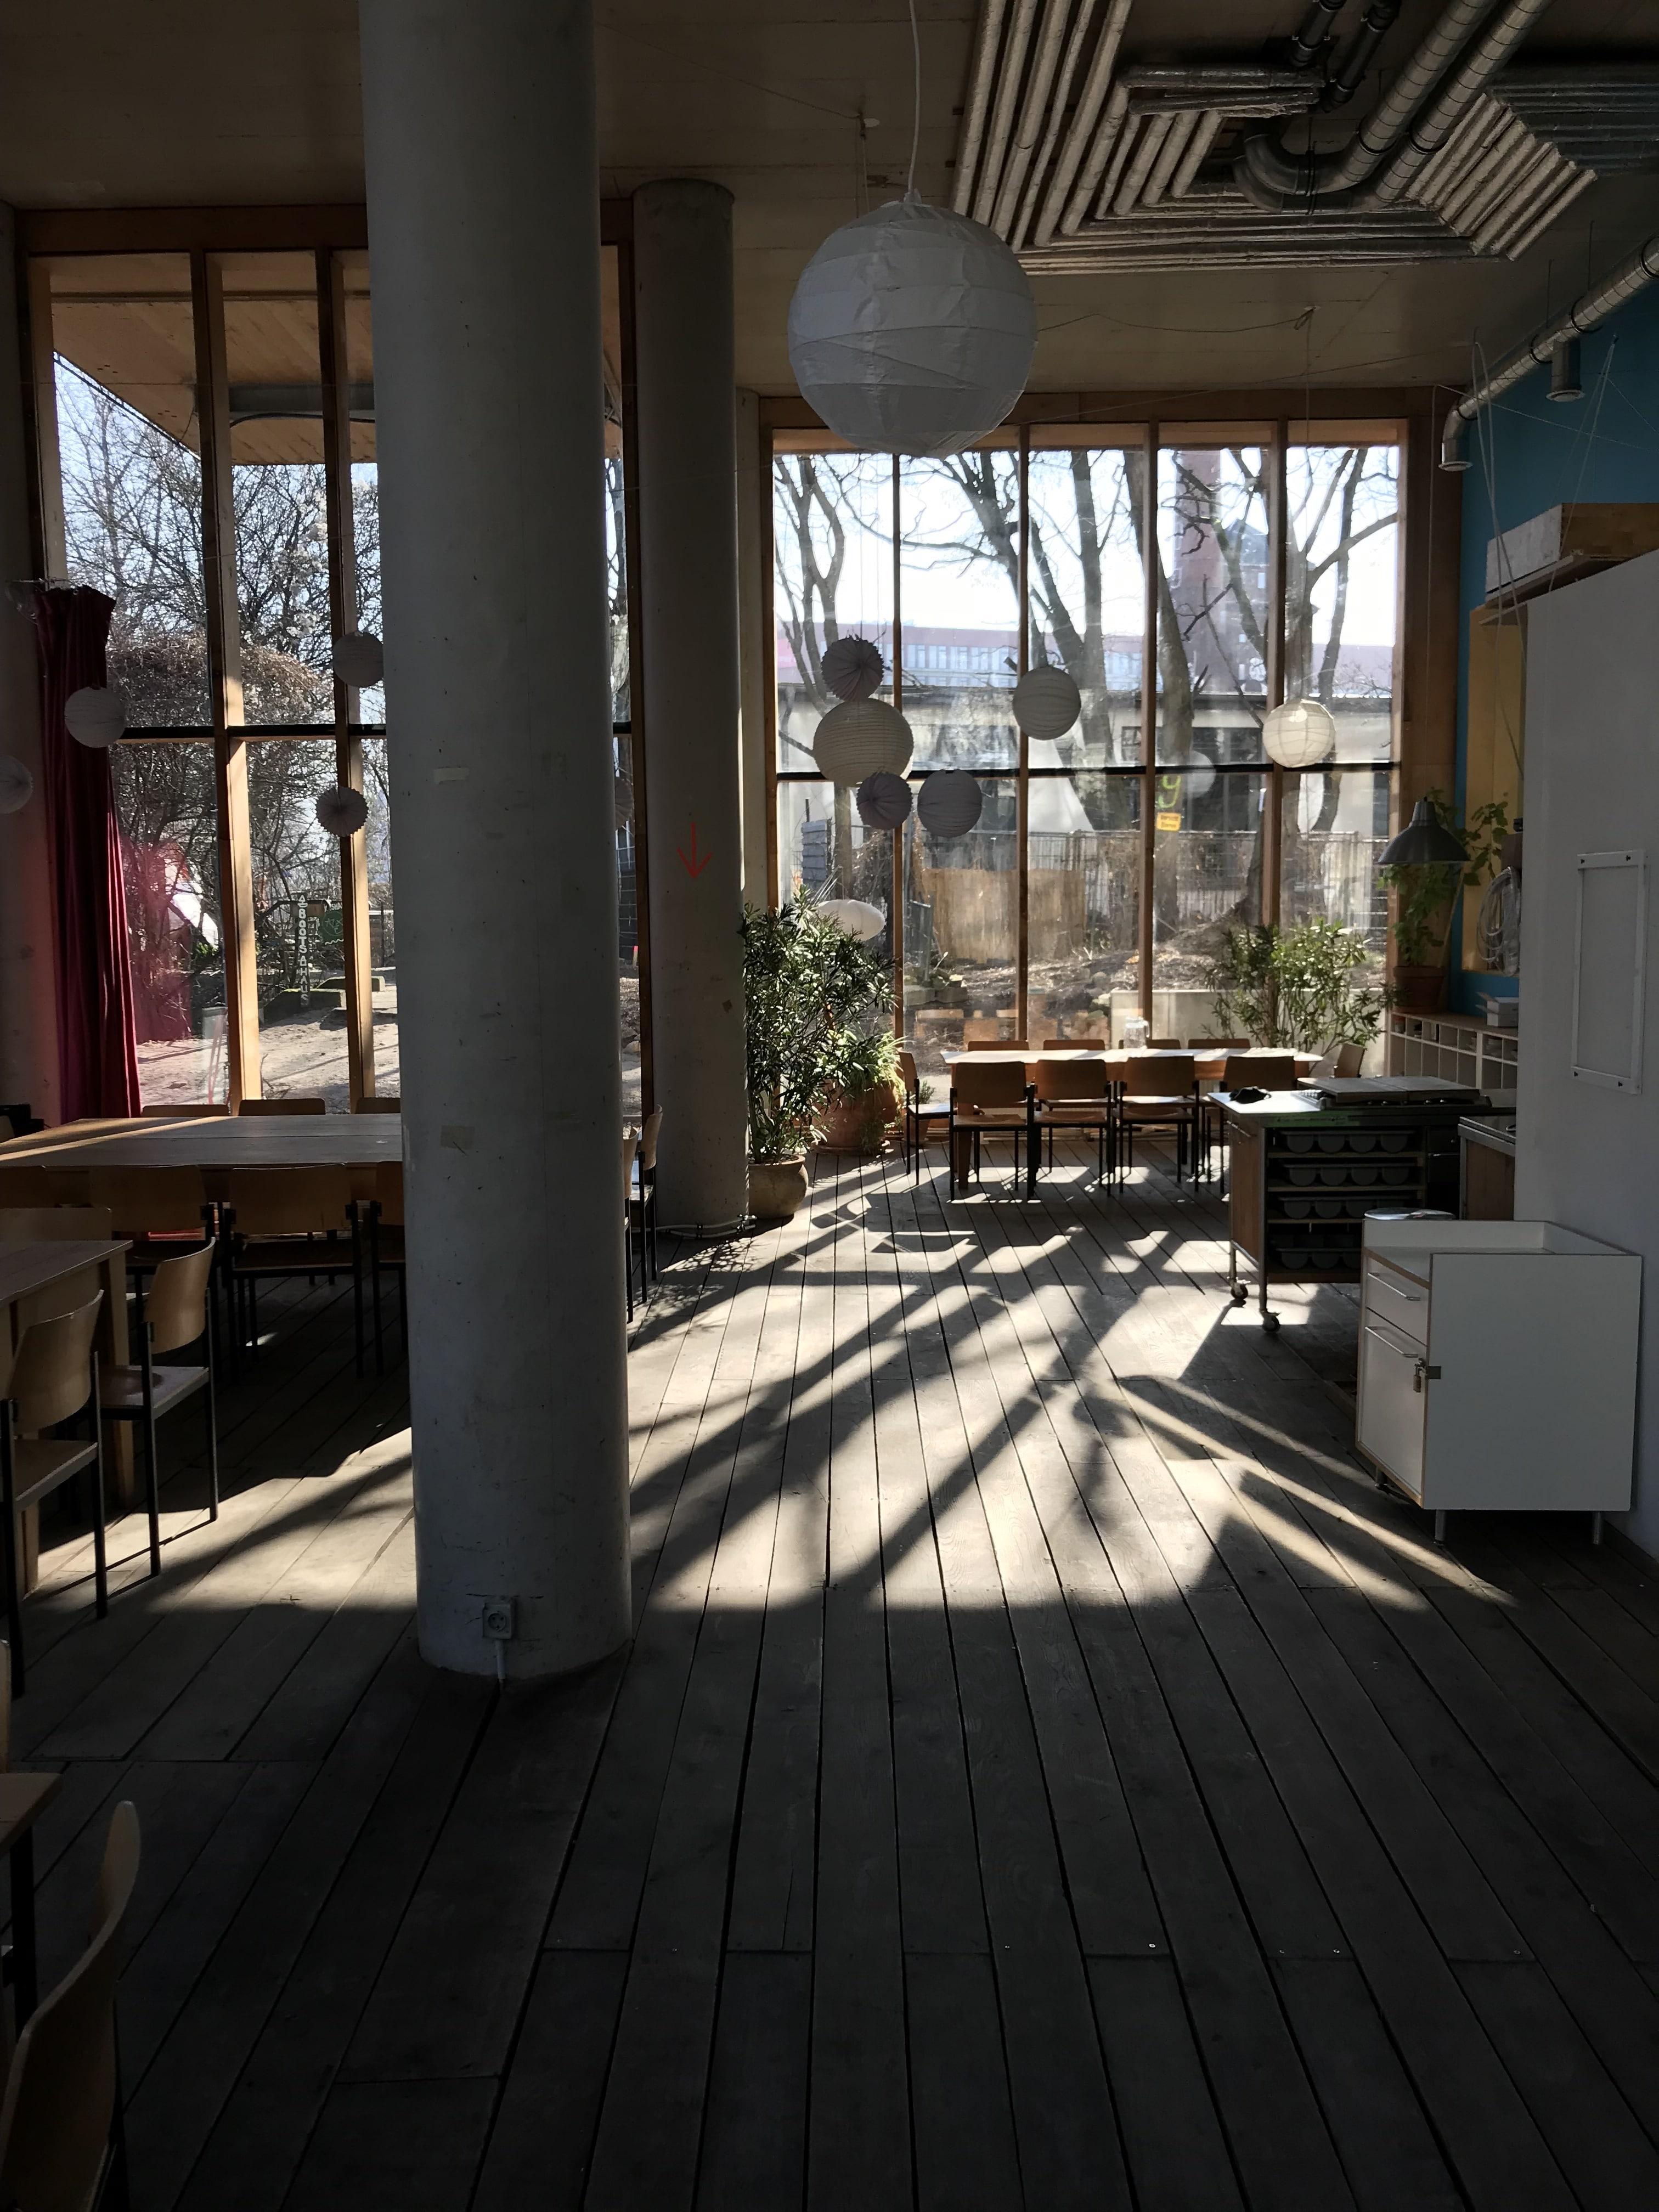 Workshop Location Veranstaltungsort key2agile am Spreeufer in Berlin